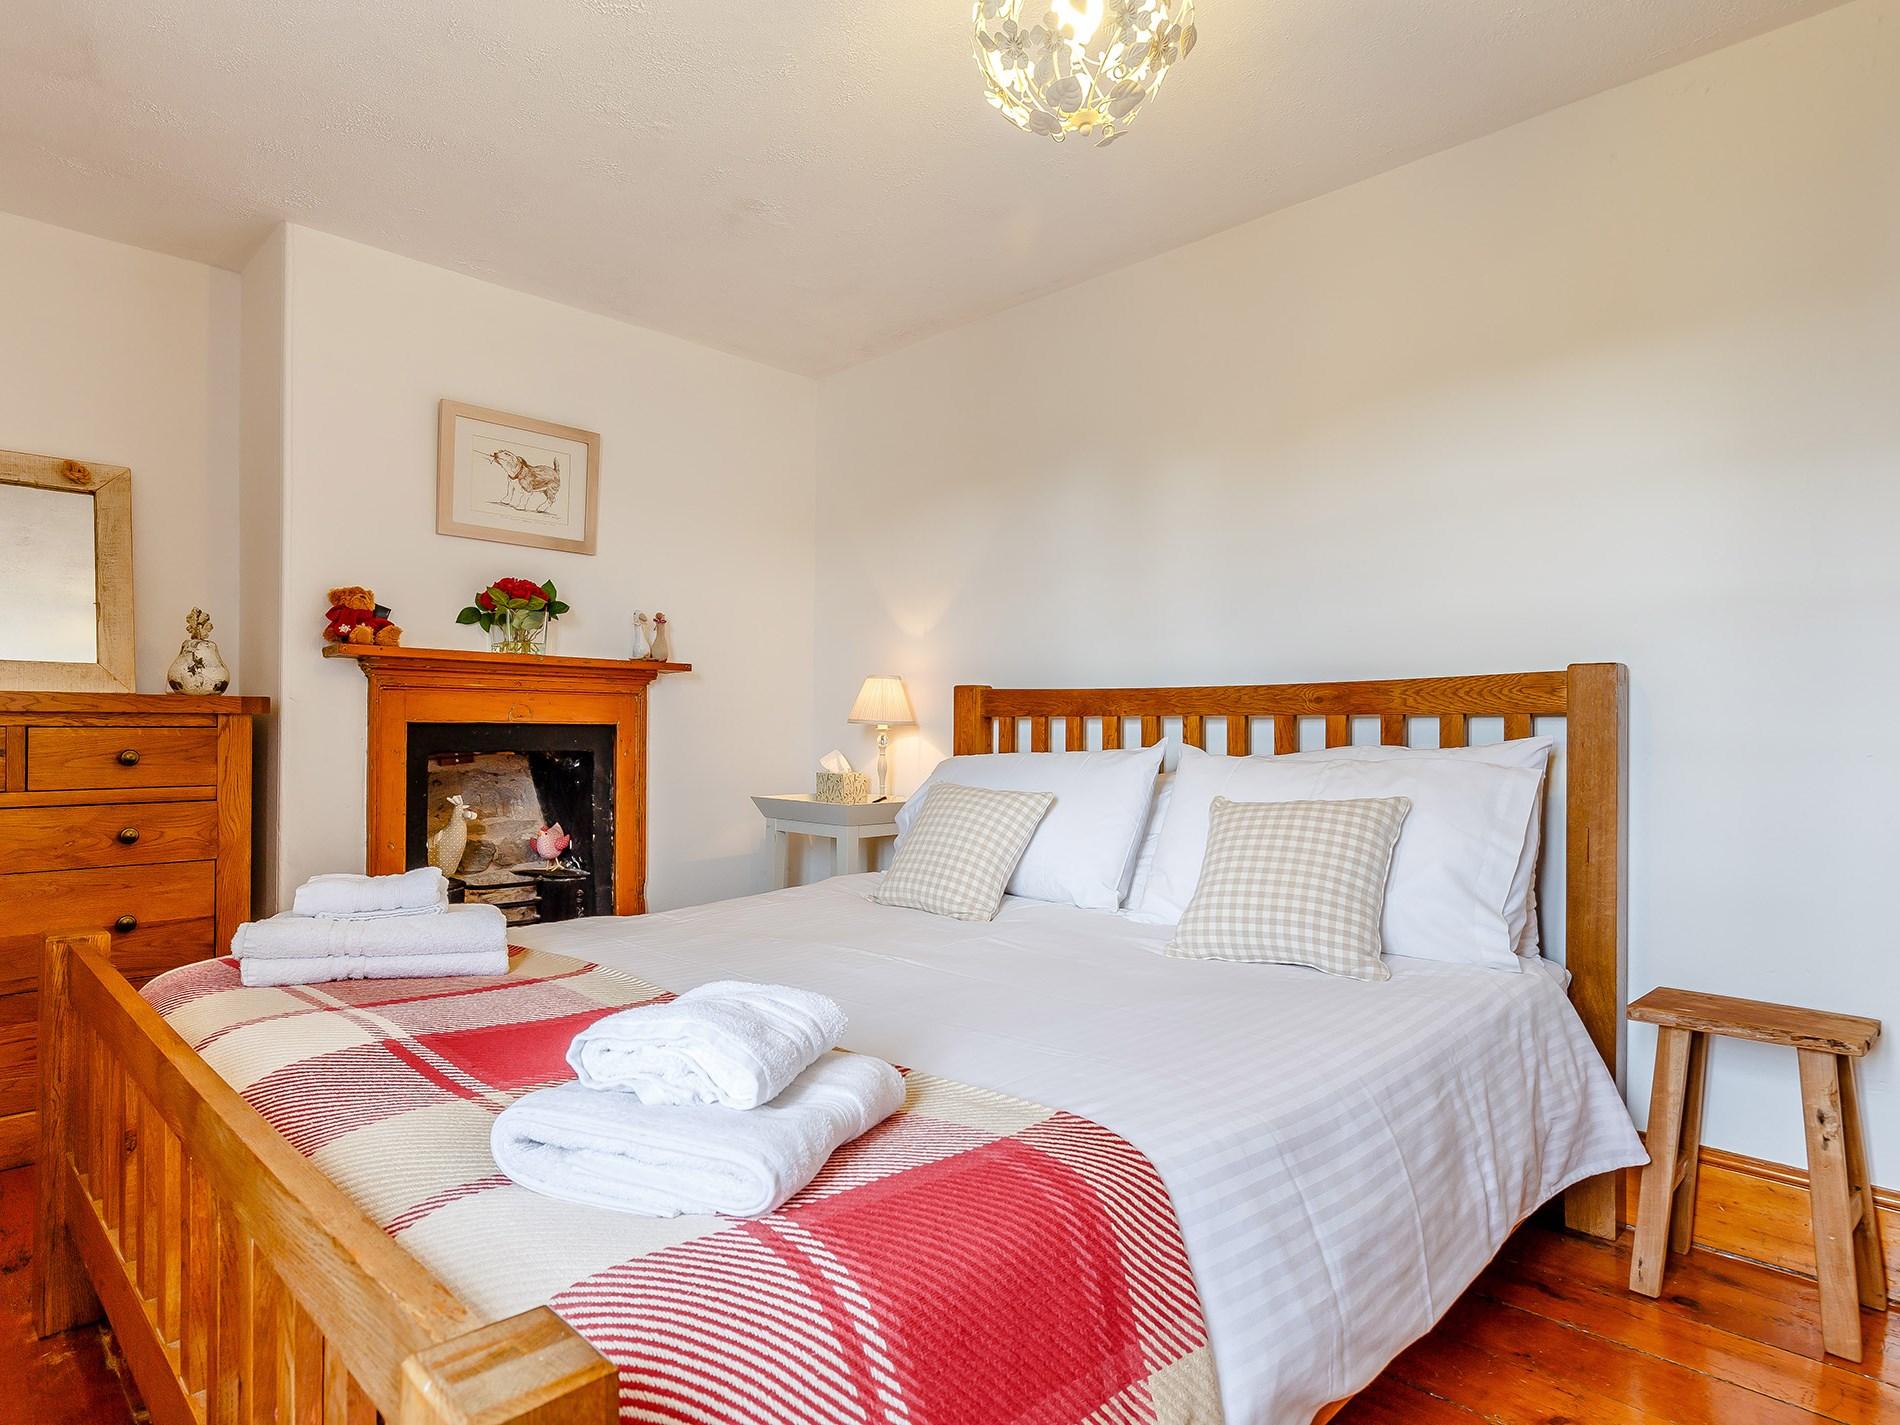 1 Bedroom Cottage in Brixham, Devon